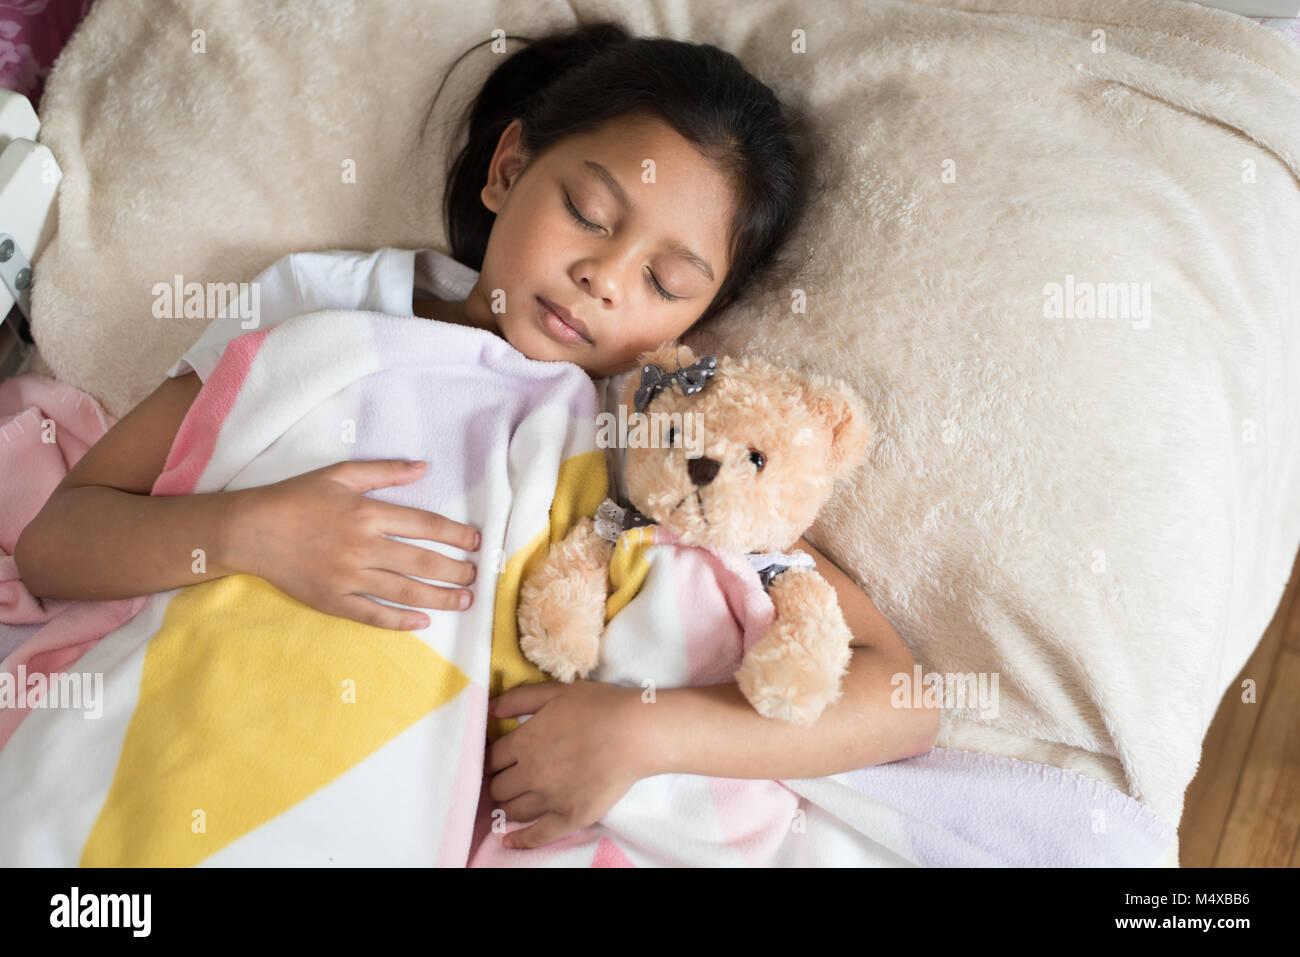 young little asian girl sleeping while hugging teddy bear. sleep concept